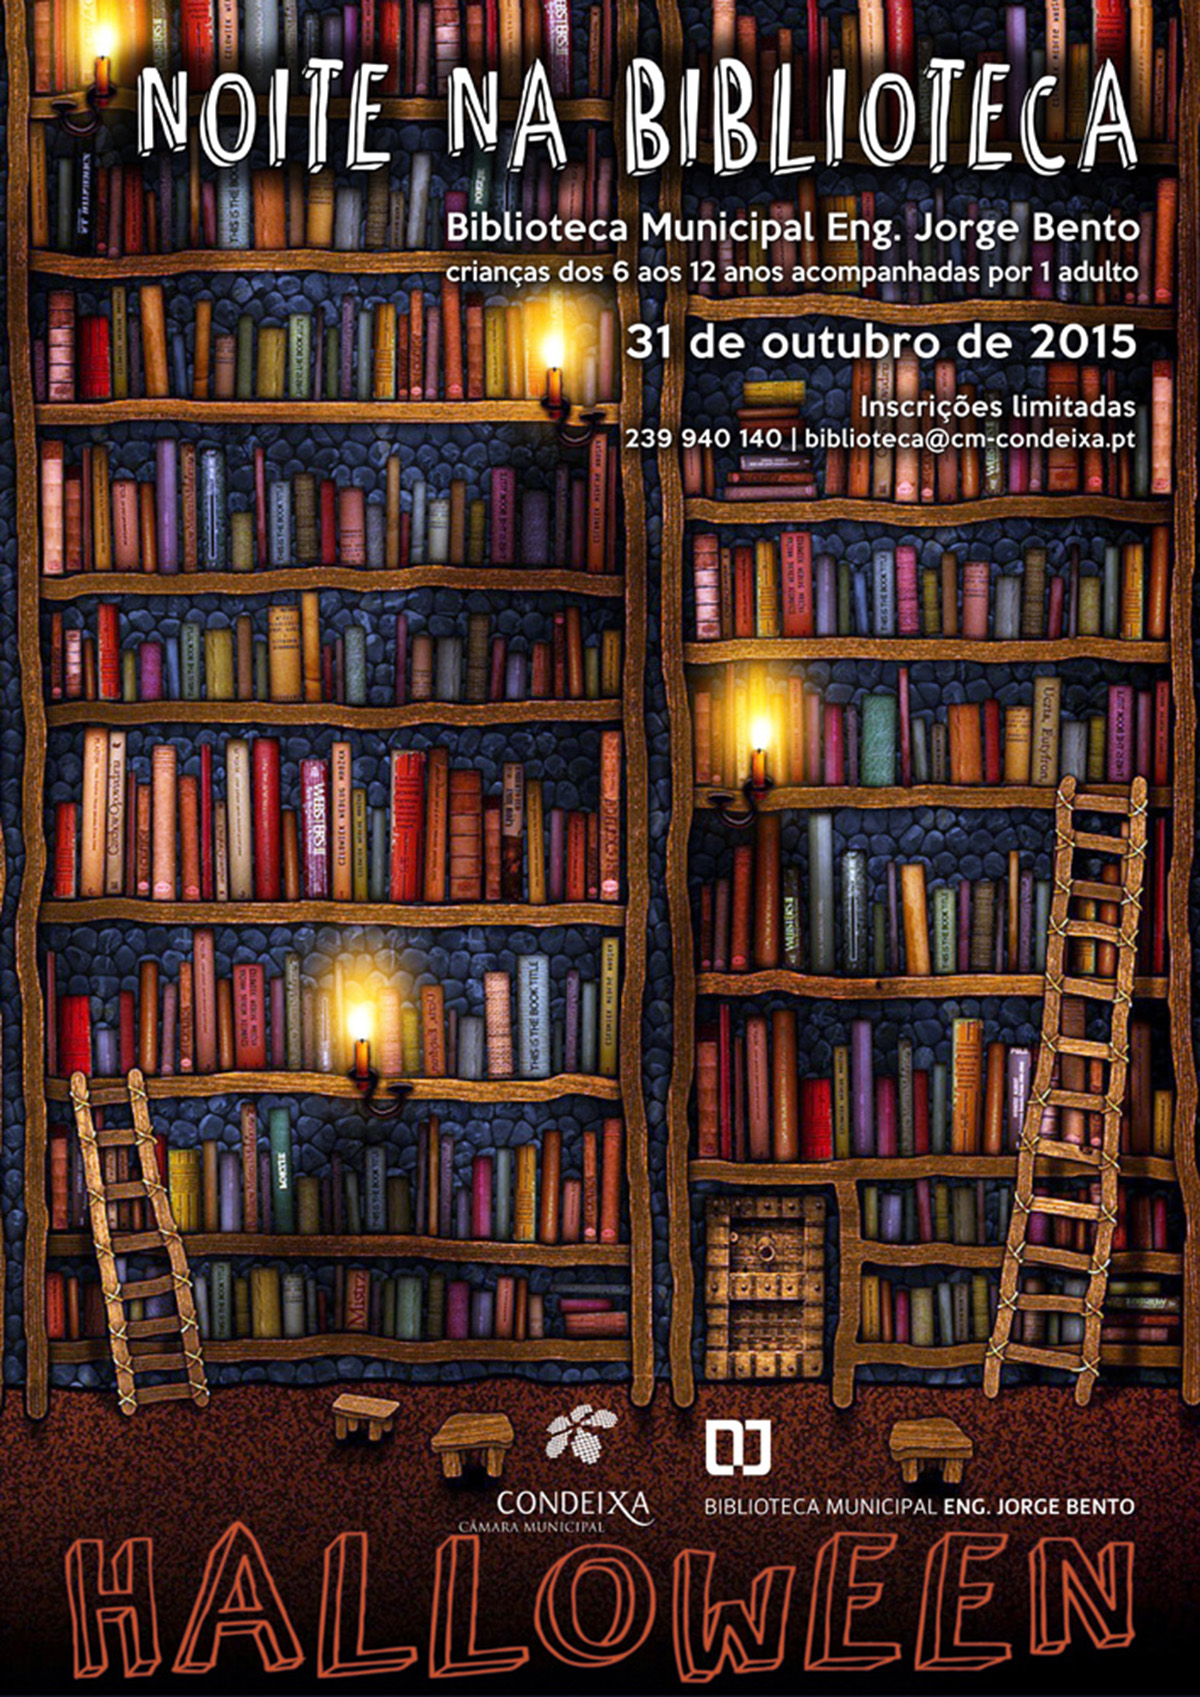 Noite na biblioteca